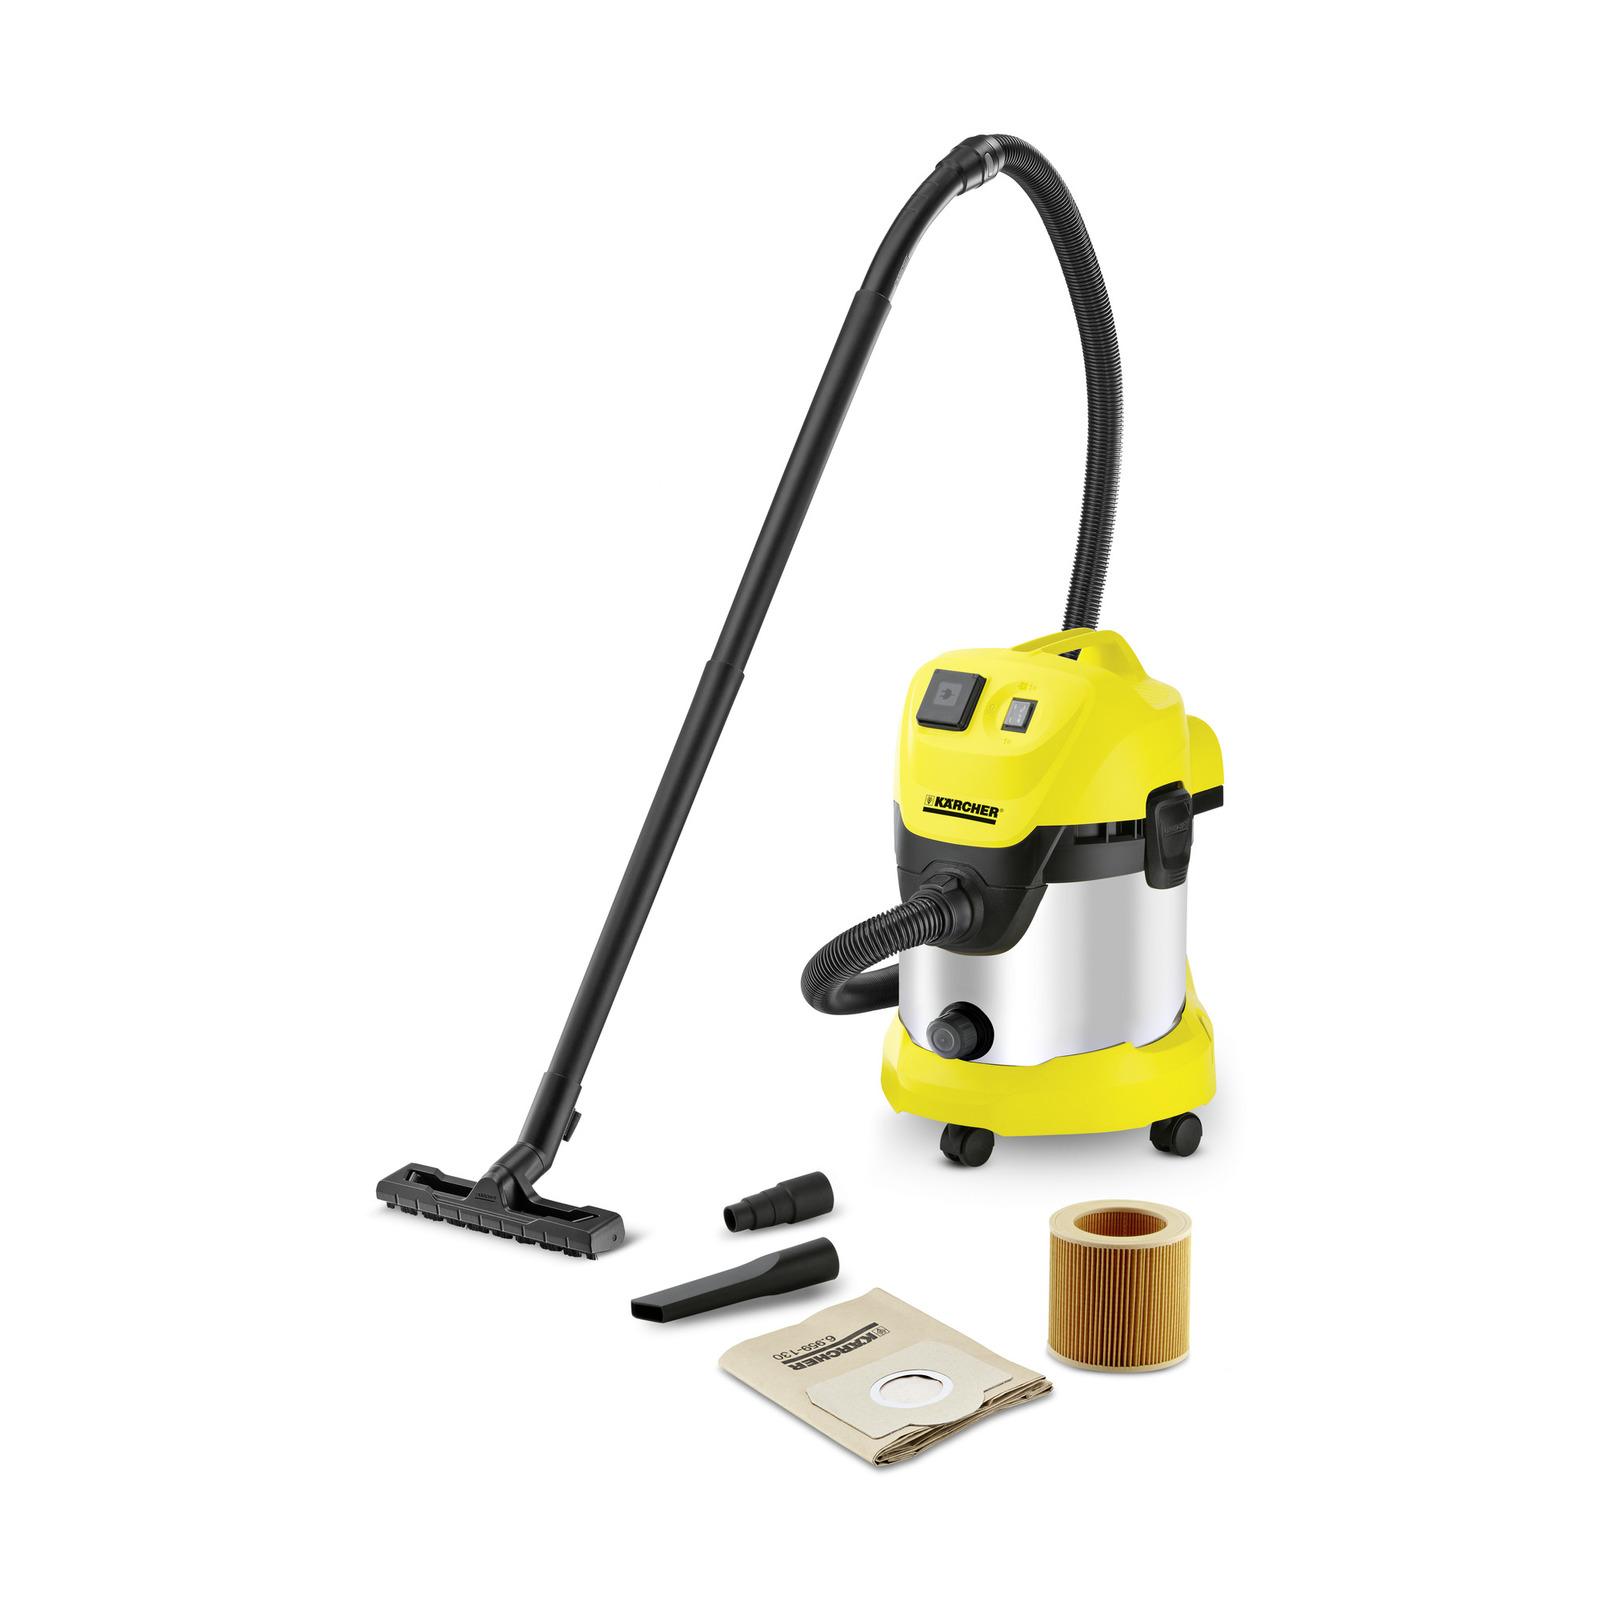 wet and dry vacuum cleaner wd 3 5 premium karcher australia. Black Bedroom Furniture Sets. Home Design Ideas